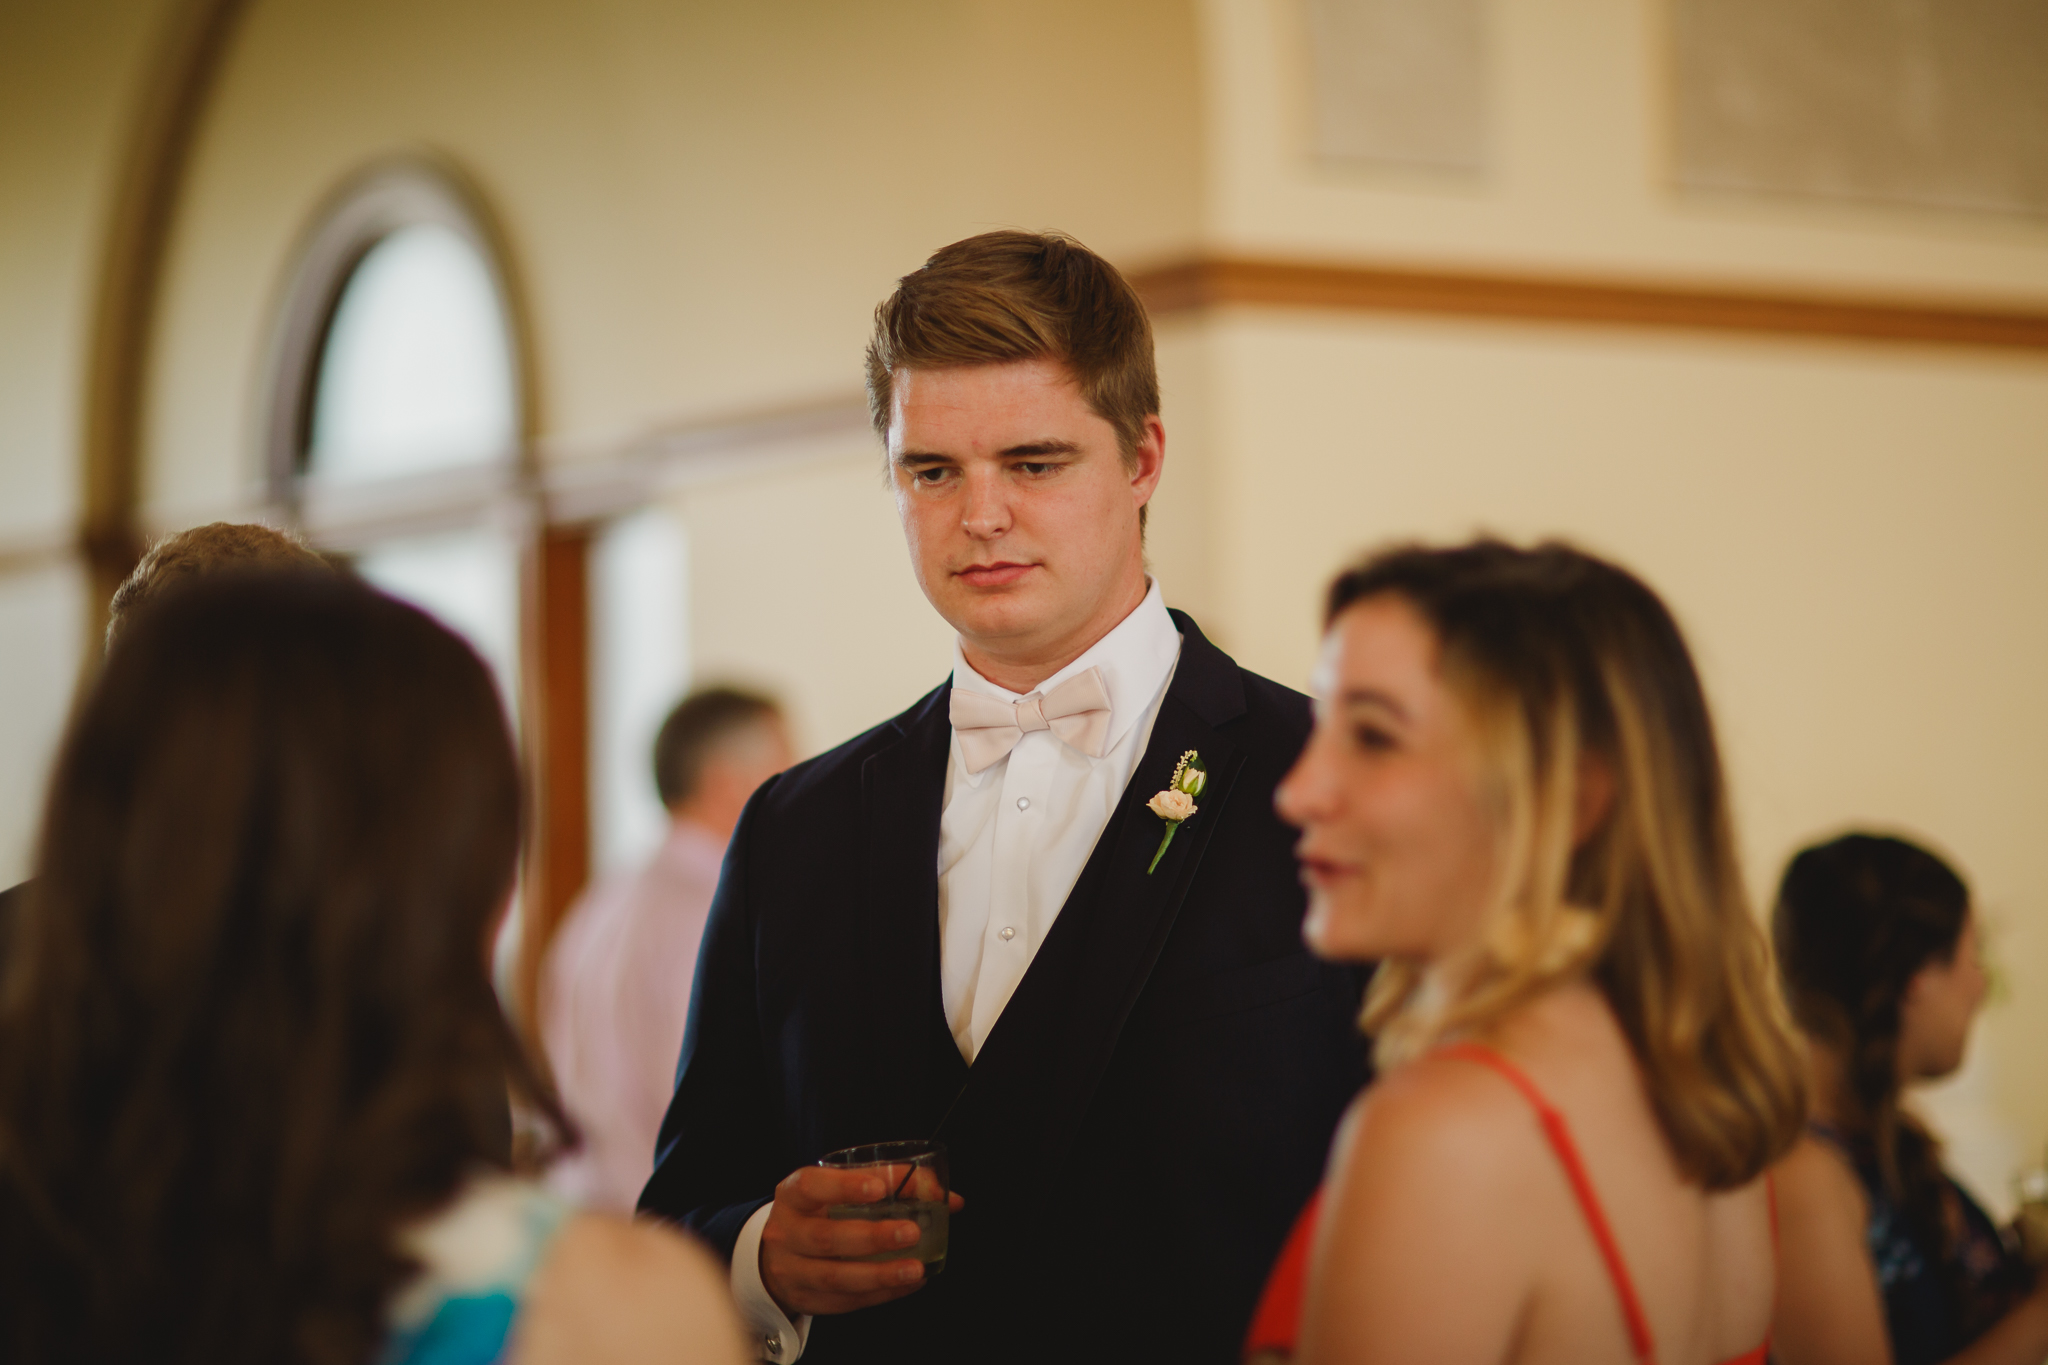 Michael and Kelly - the ashton depot - wedding DFW - wedding photographer- elizalde photography (89 of 150).jpg